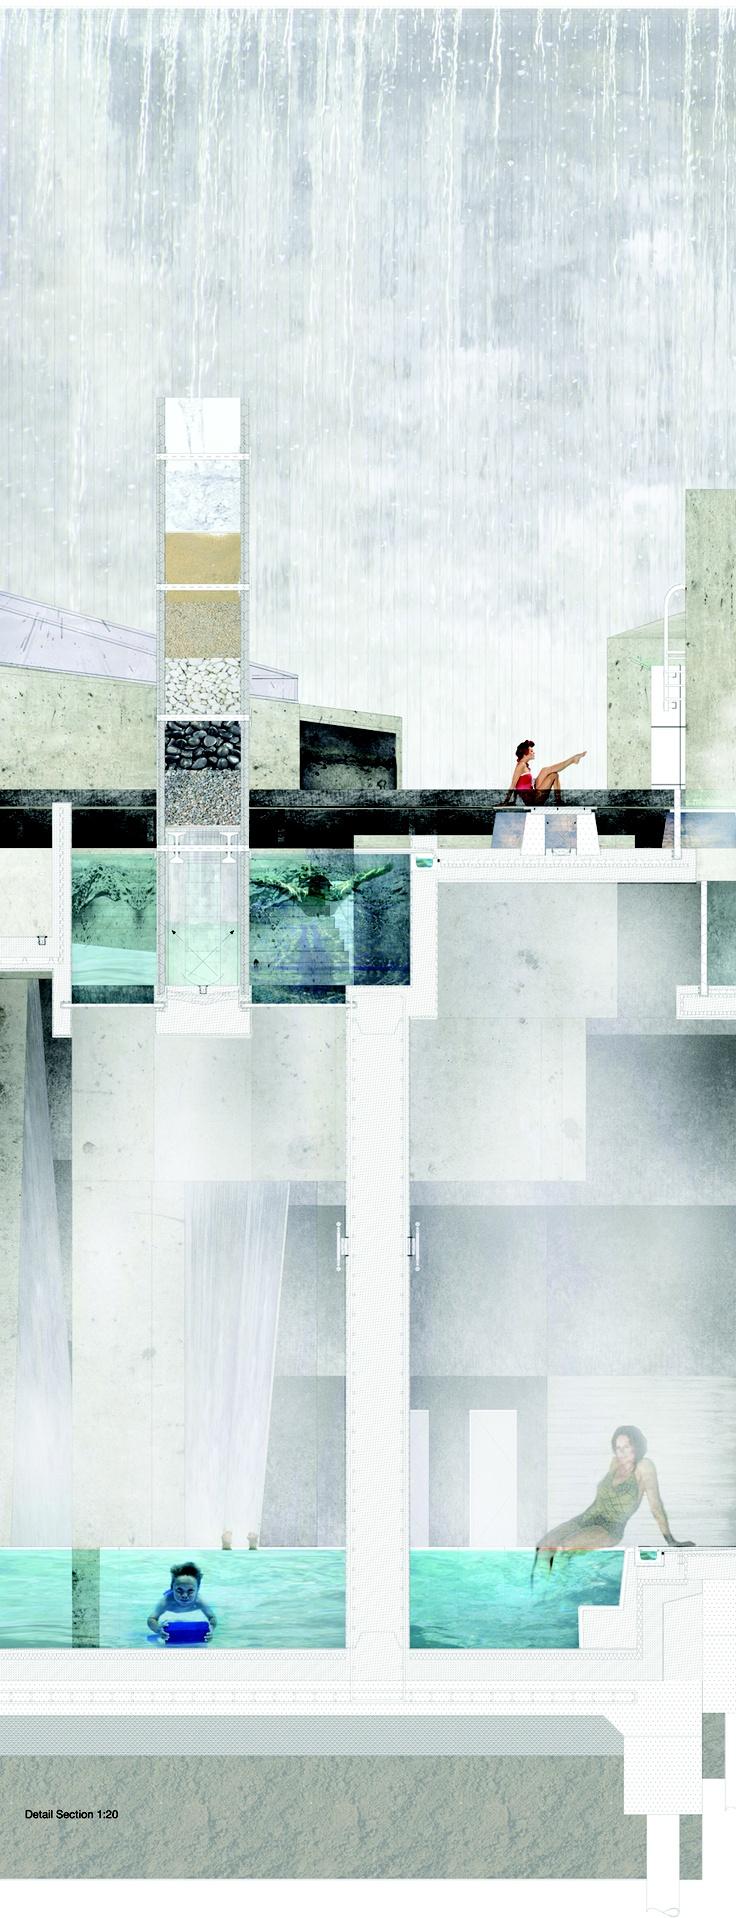 Harry Varnavas, BA (Hons) Architecture (ARB/RIBA Part 1), UCA Canterbury